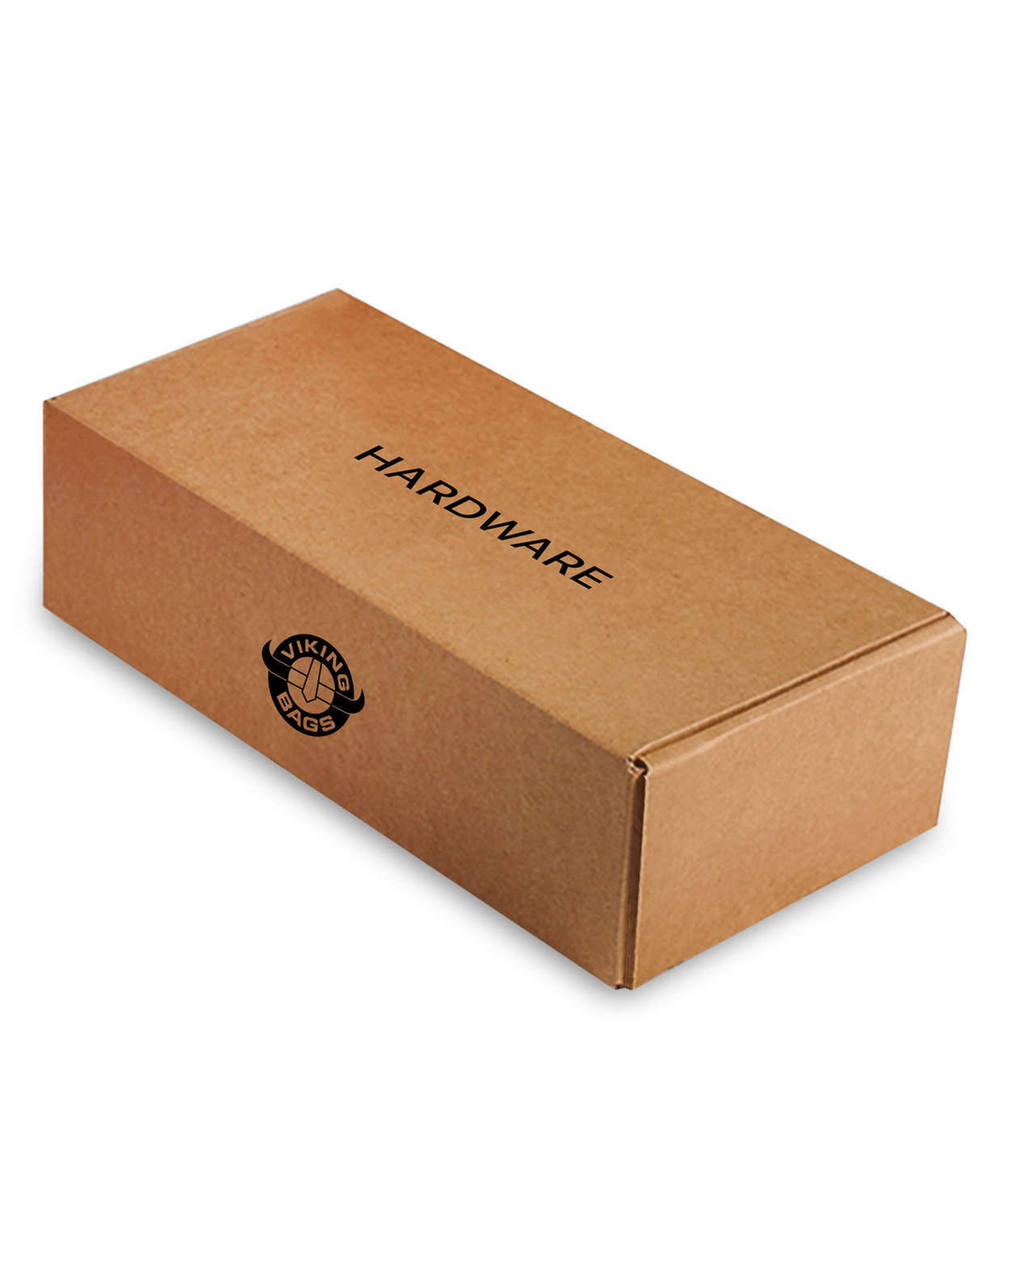 Honda VTX 1800 S Viking Lamellar Large Black Hard Saddlebags box